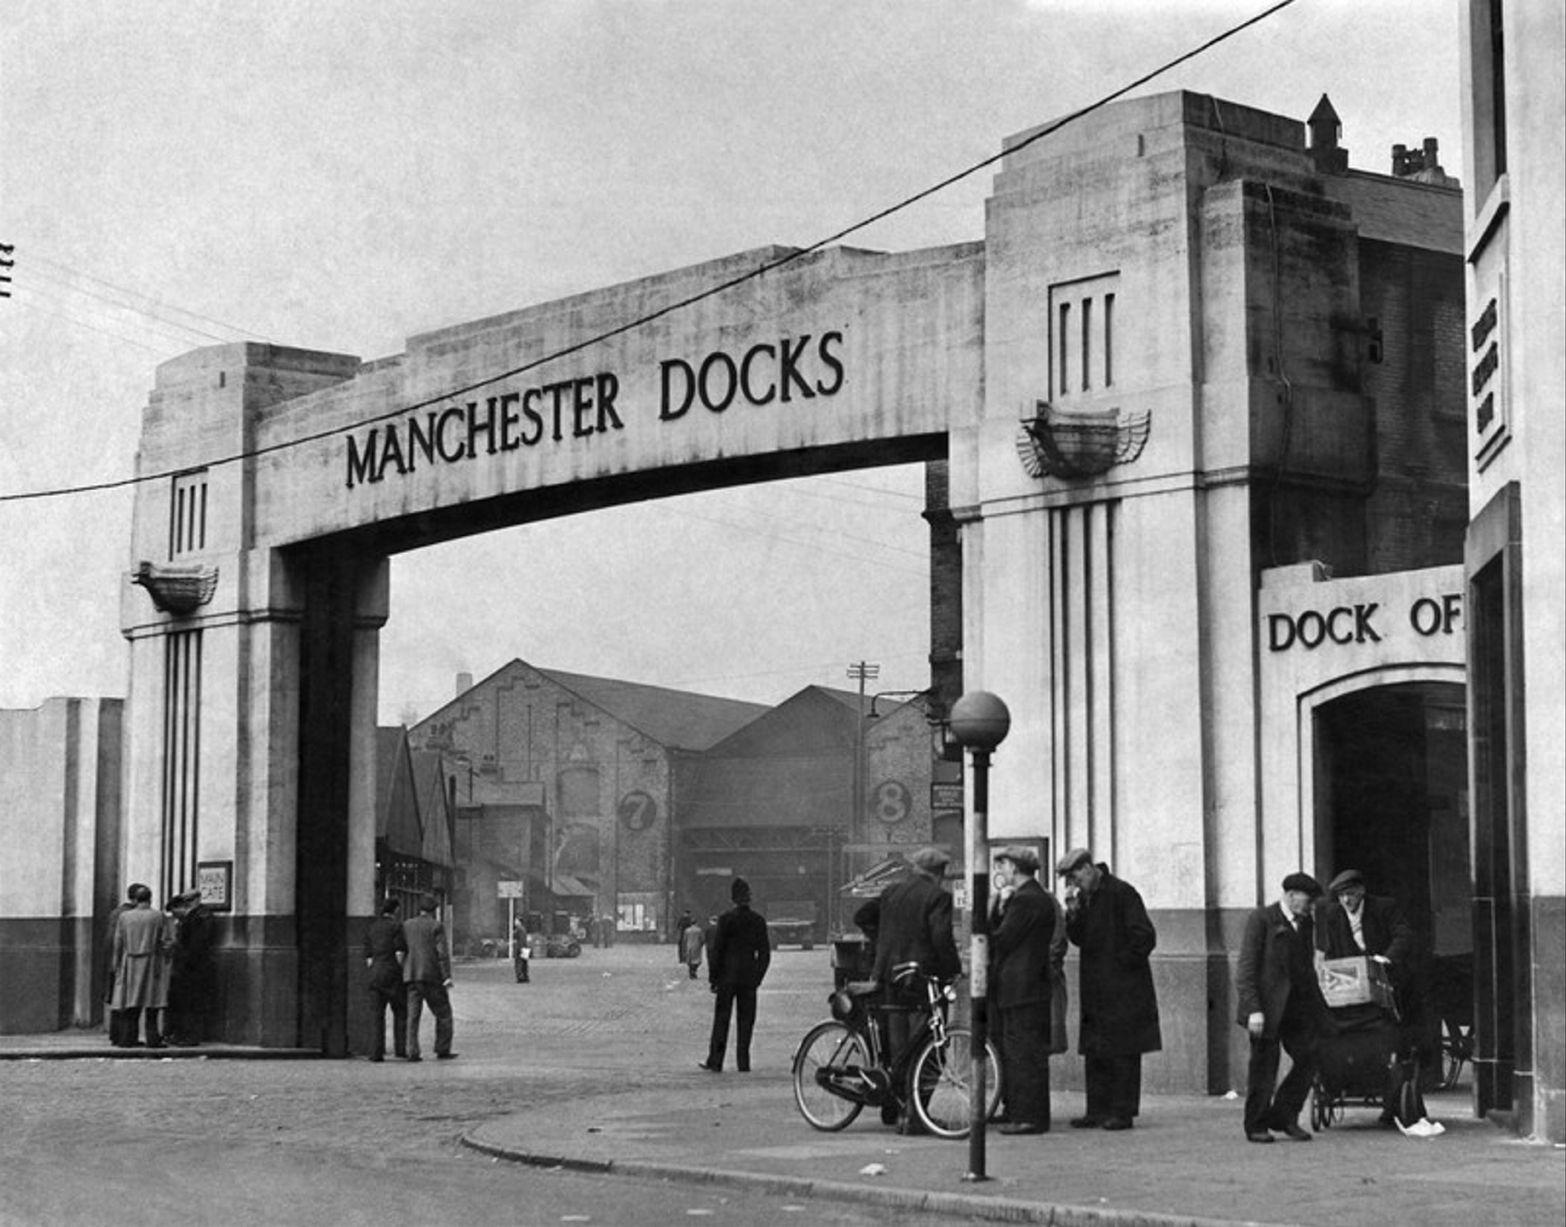 Manchester Docks, May 1951